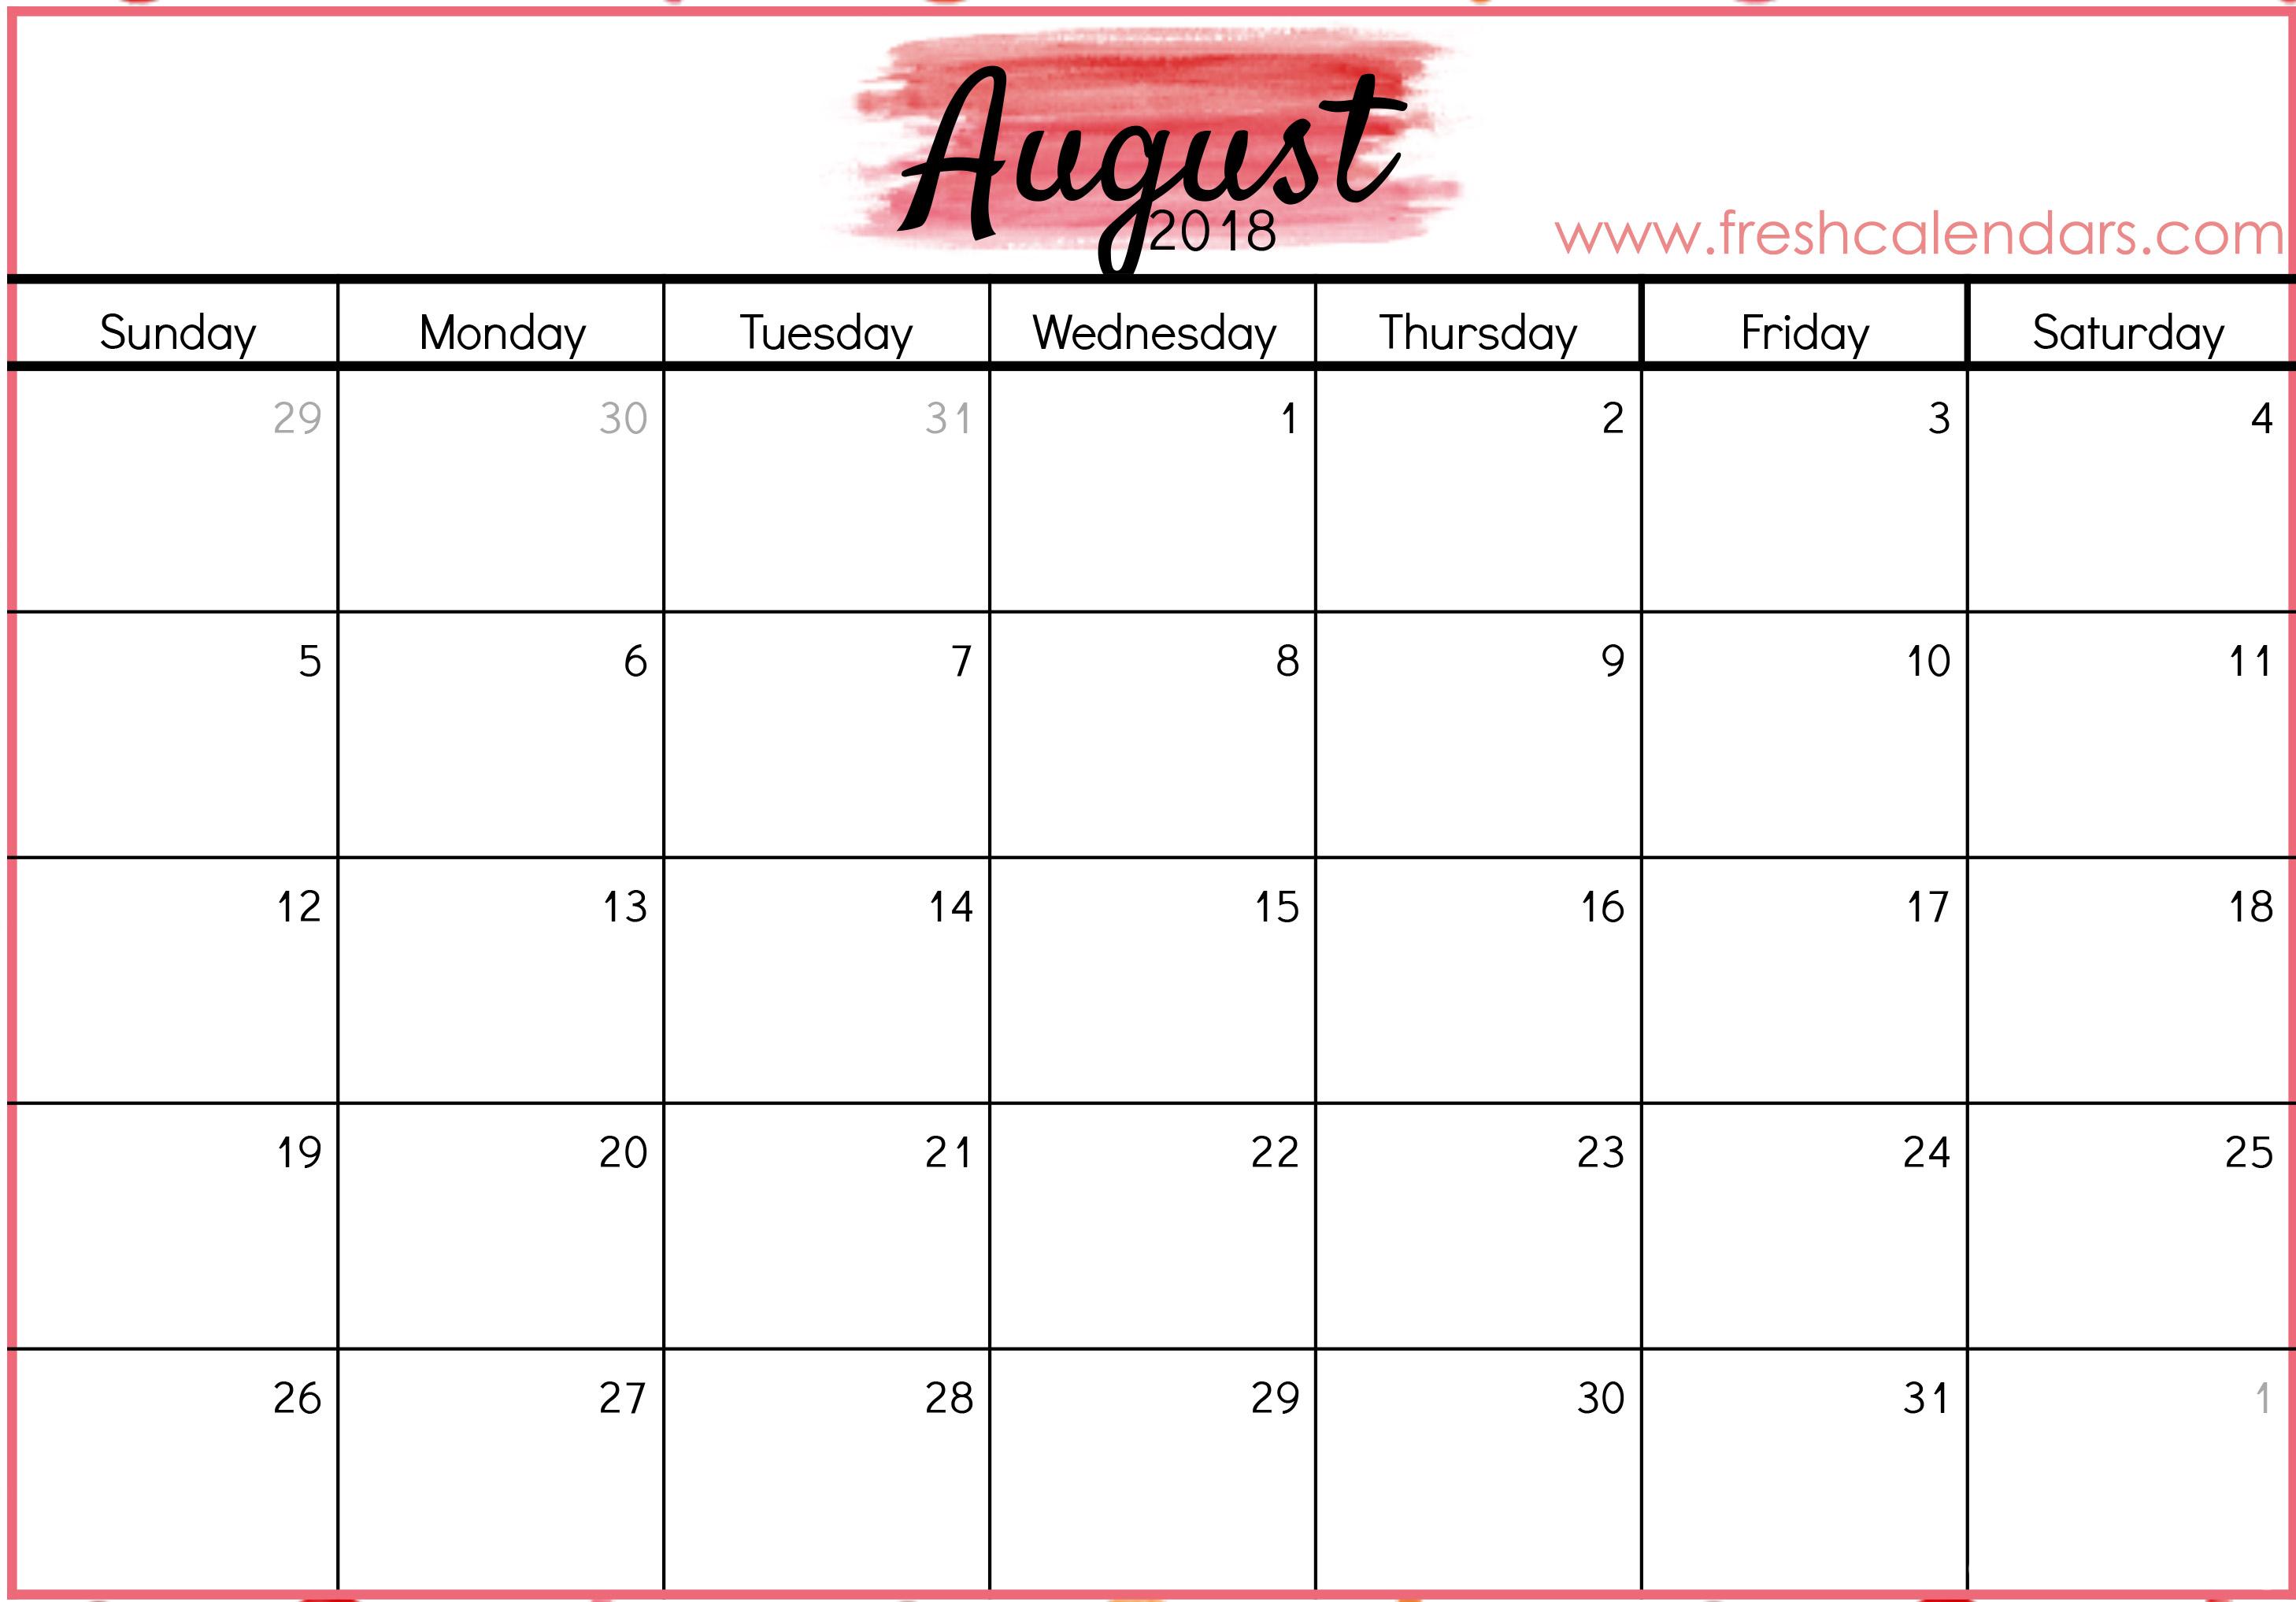 August 2018 Calendar Printable - Fresh Calendars with Blank Calendars For August